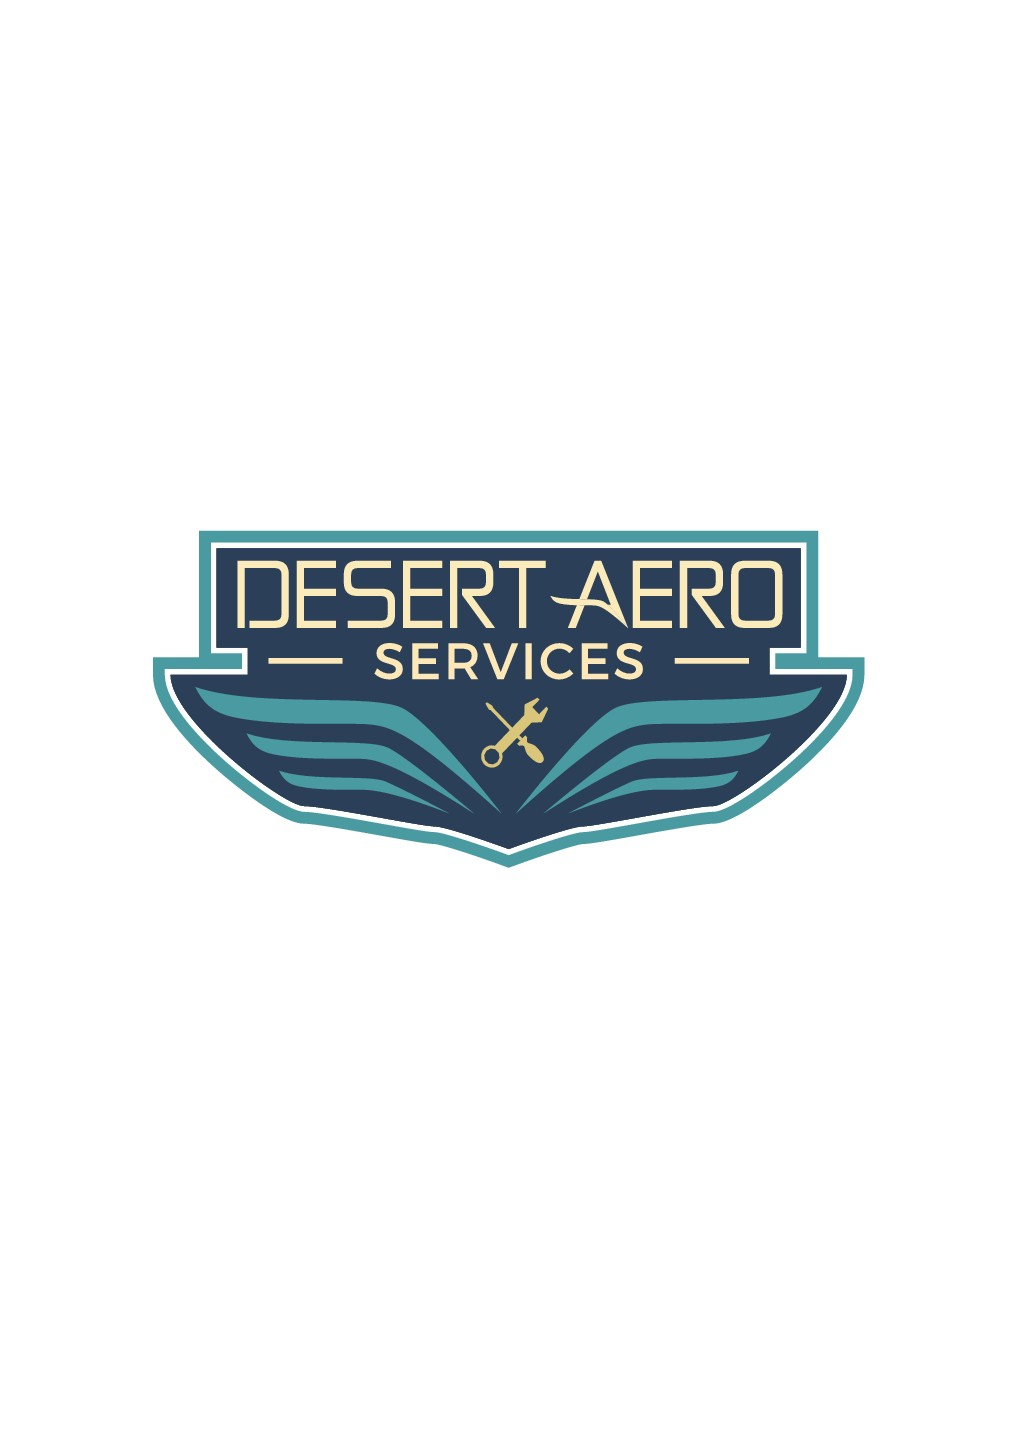 Aviation Maintenance Company needs a smart modern logo